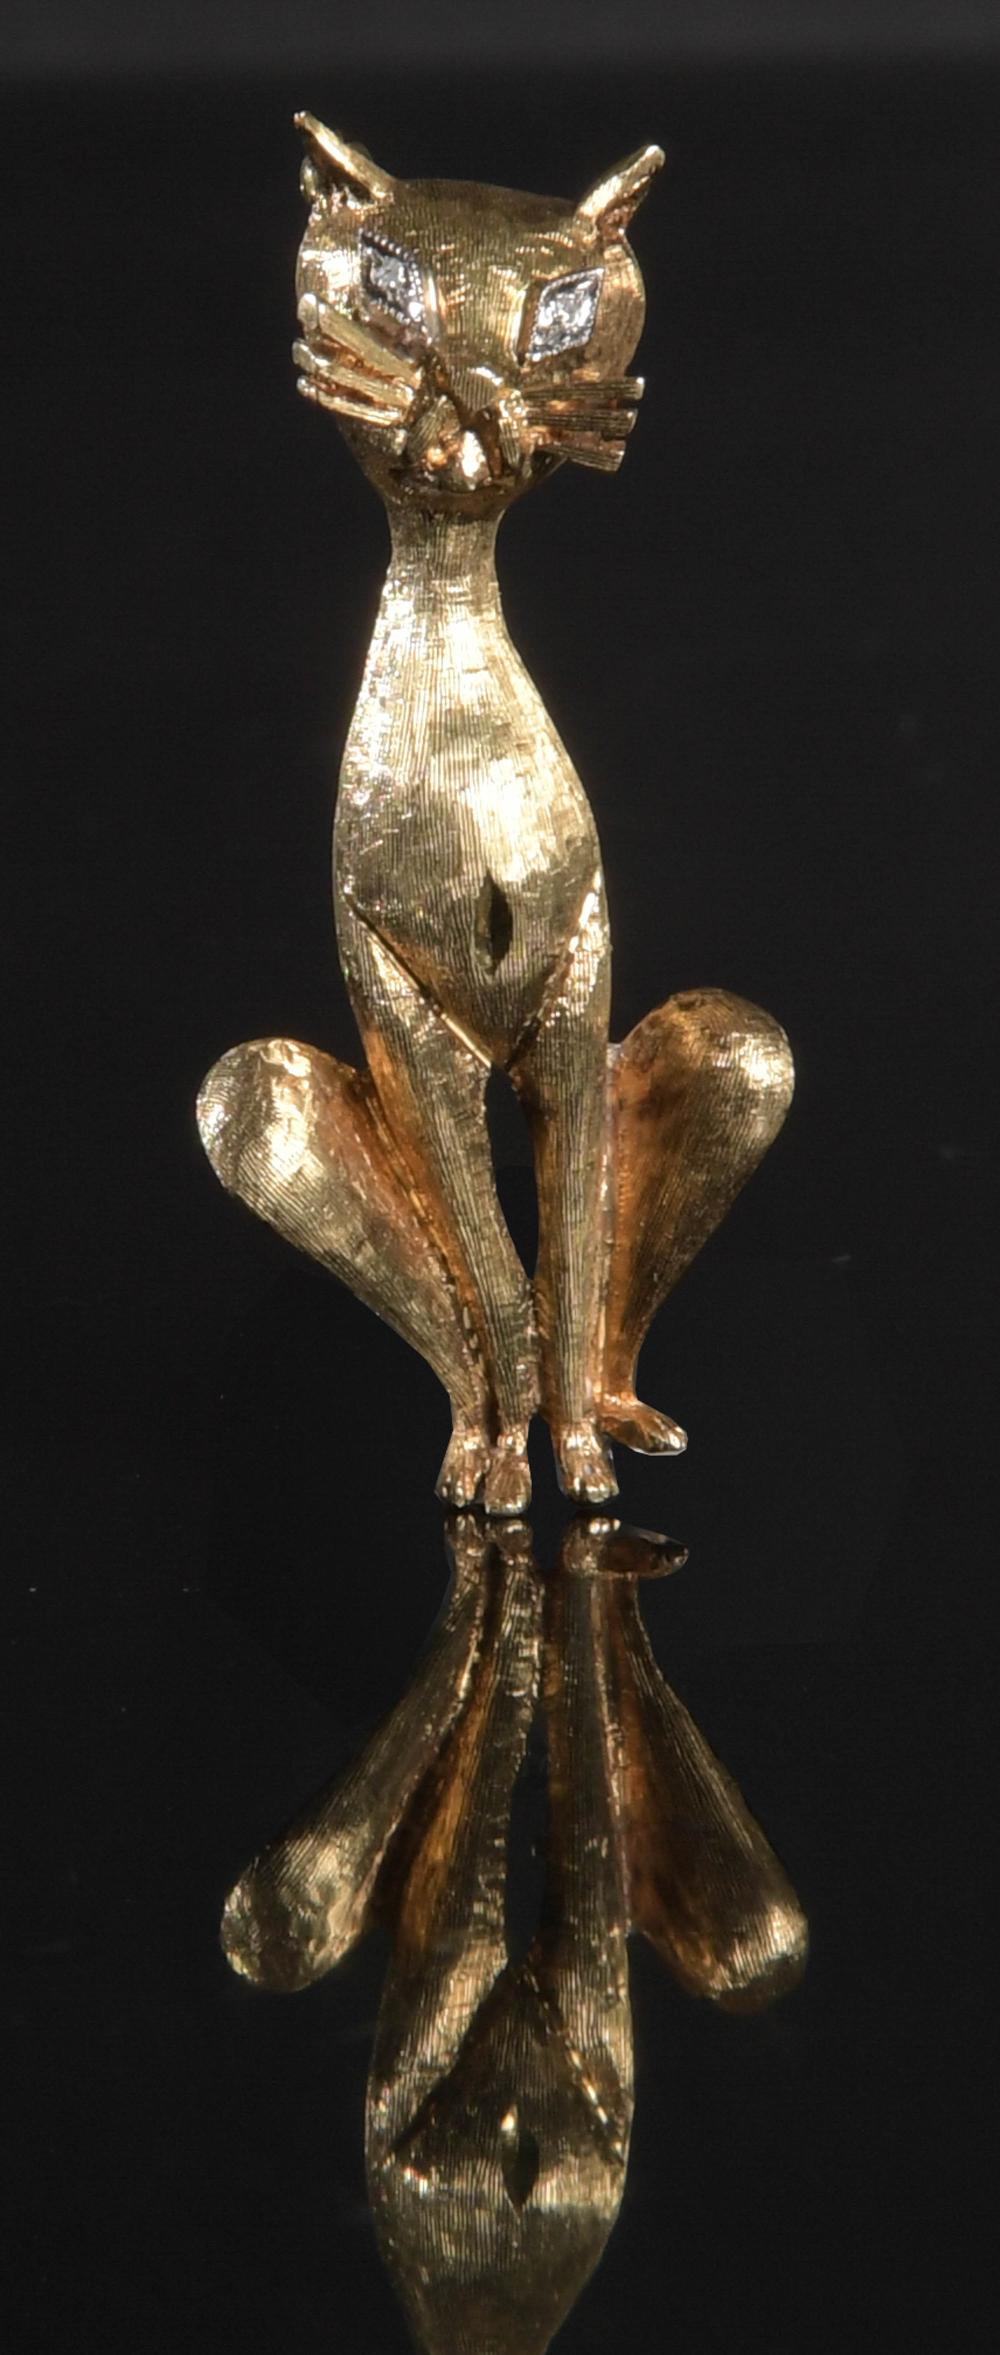 18K GOLD CAT BROOCH WITH DIAMOND EYES